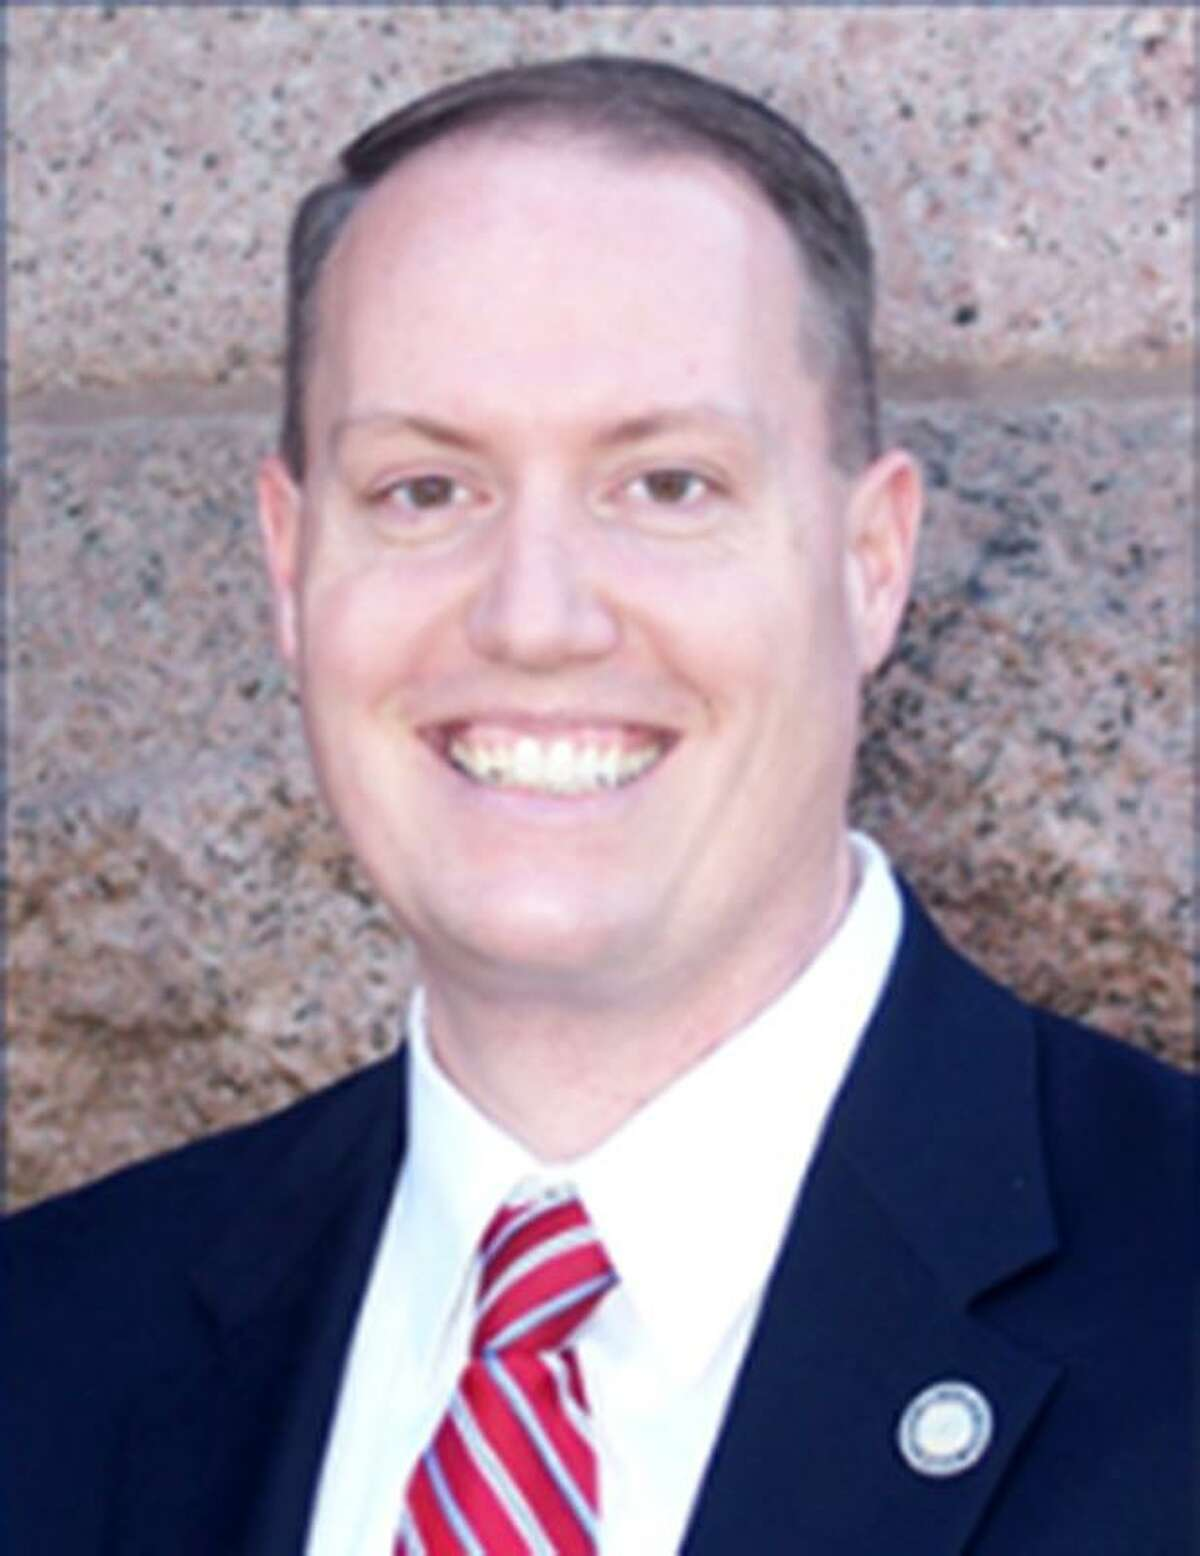 Dan Curry, Bexar County director of facilities management